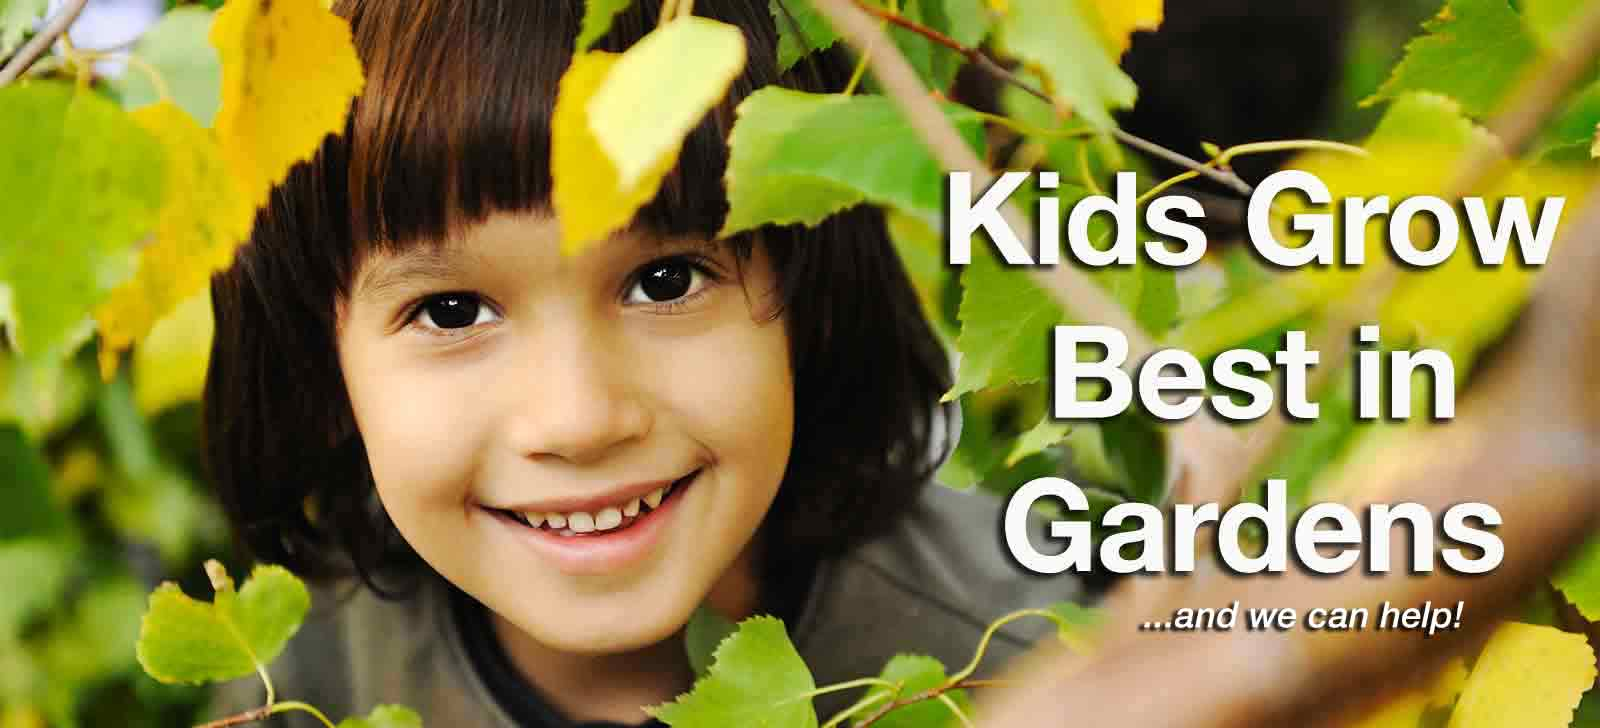 KidsGrowBest-help